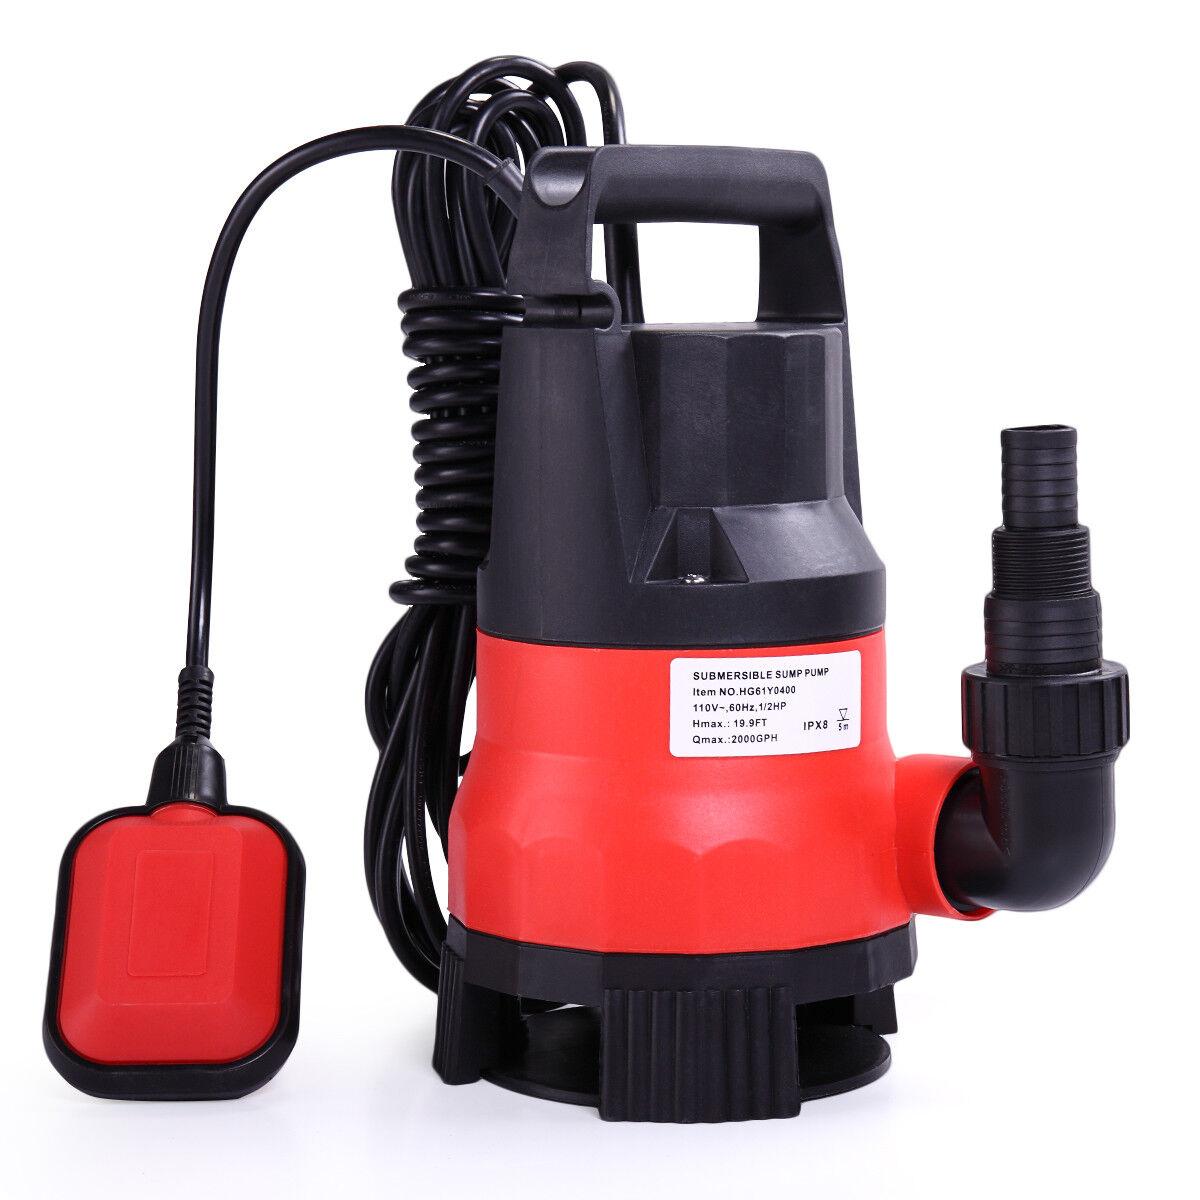 Submersible Water Pump 1 2 HP 2000GPH Clean Clear Dirty Pool Pond Flood Drain